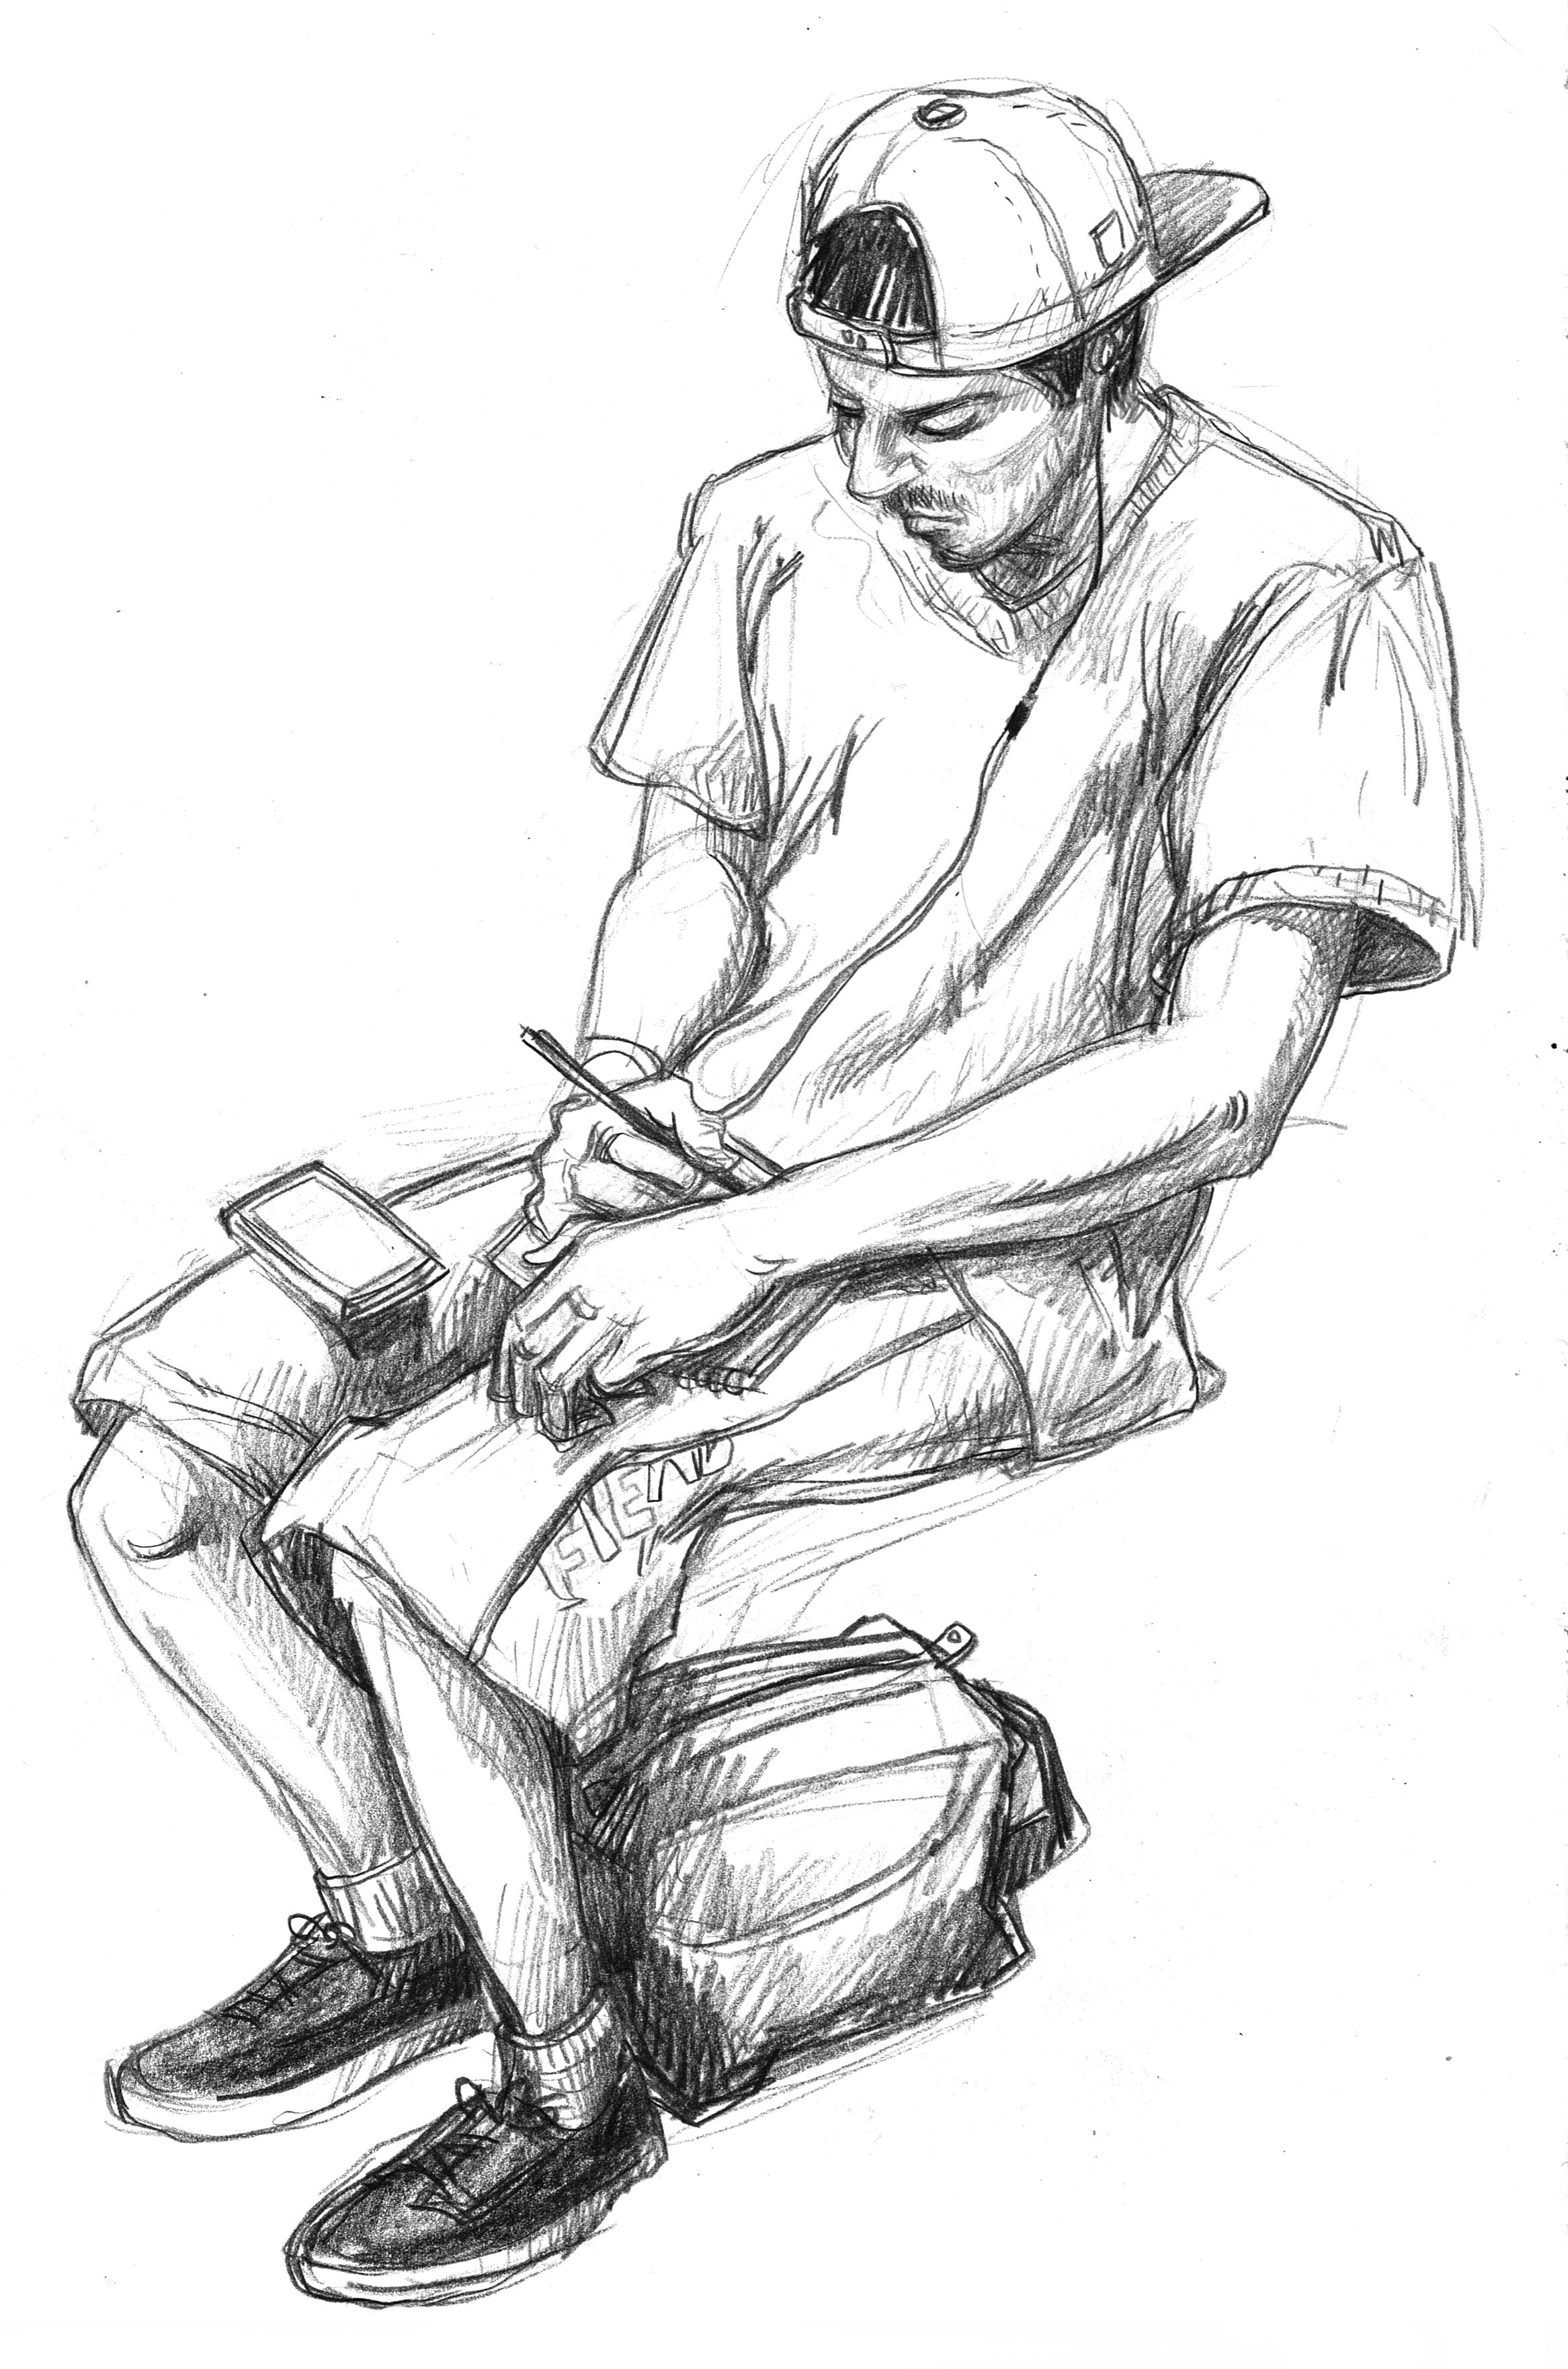 Metro guy in shorts